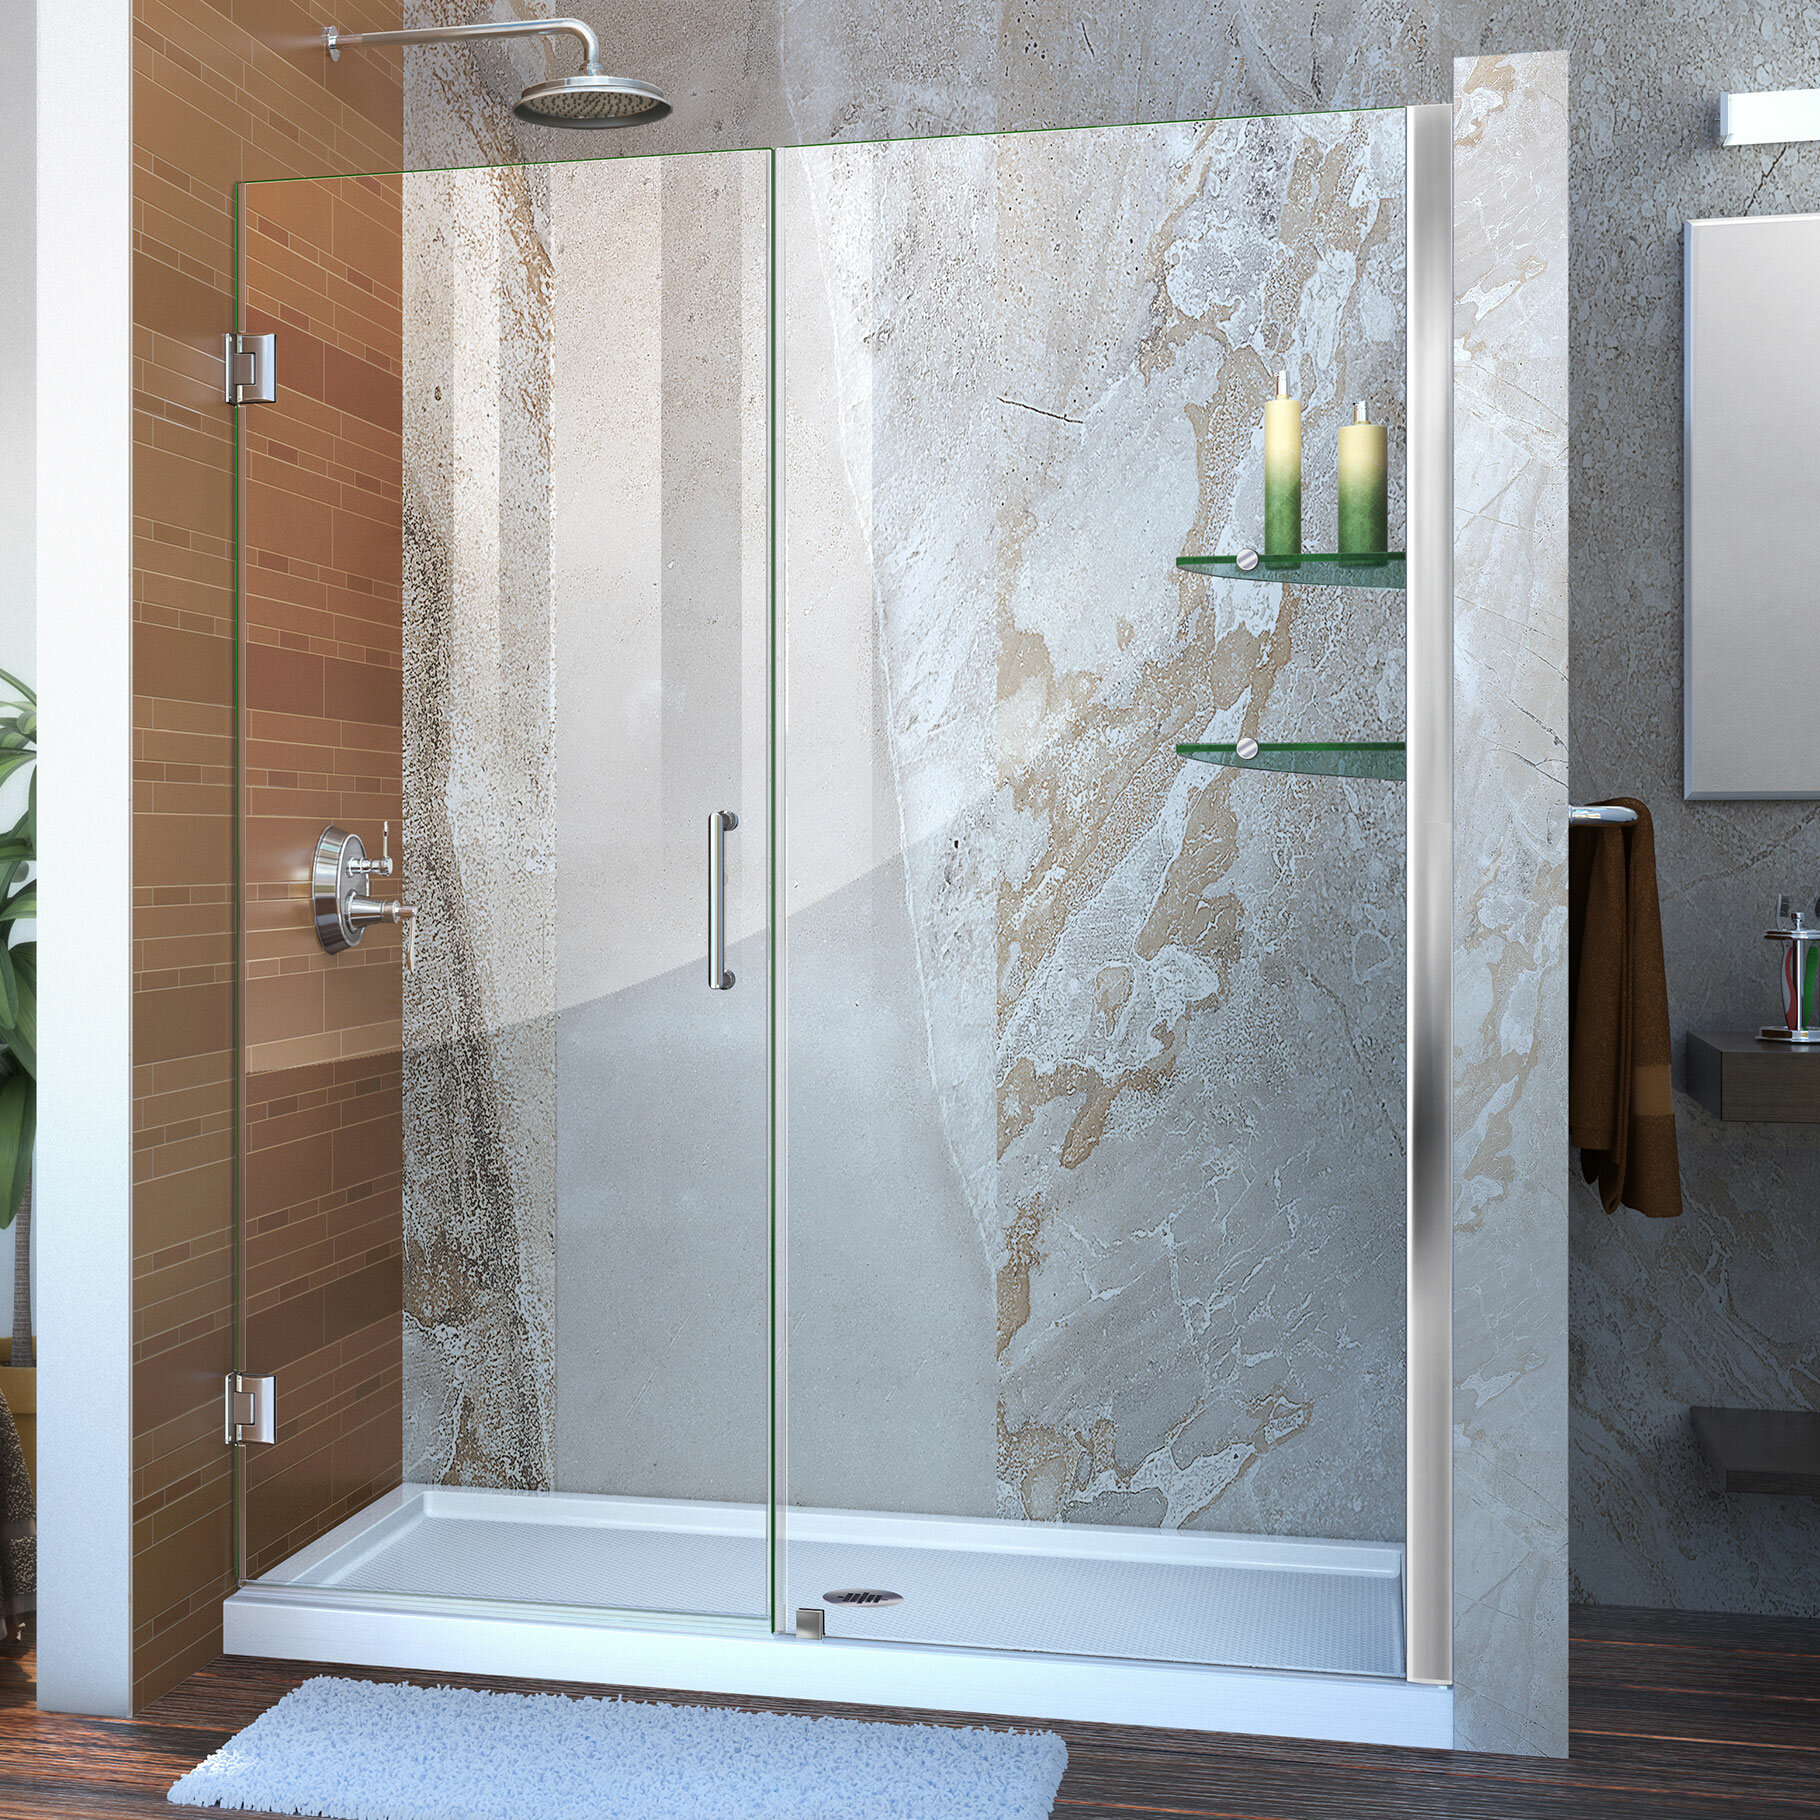 Unidoor 60 X 72 Hinged Frameless Shower Door With Clearmax Technology